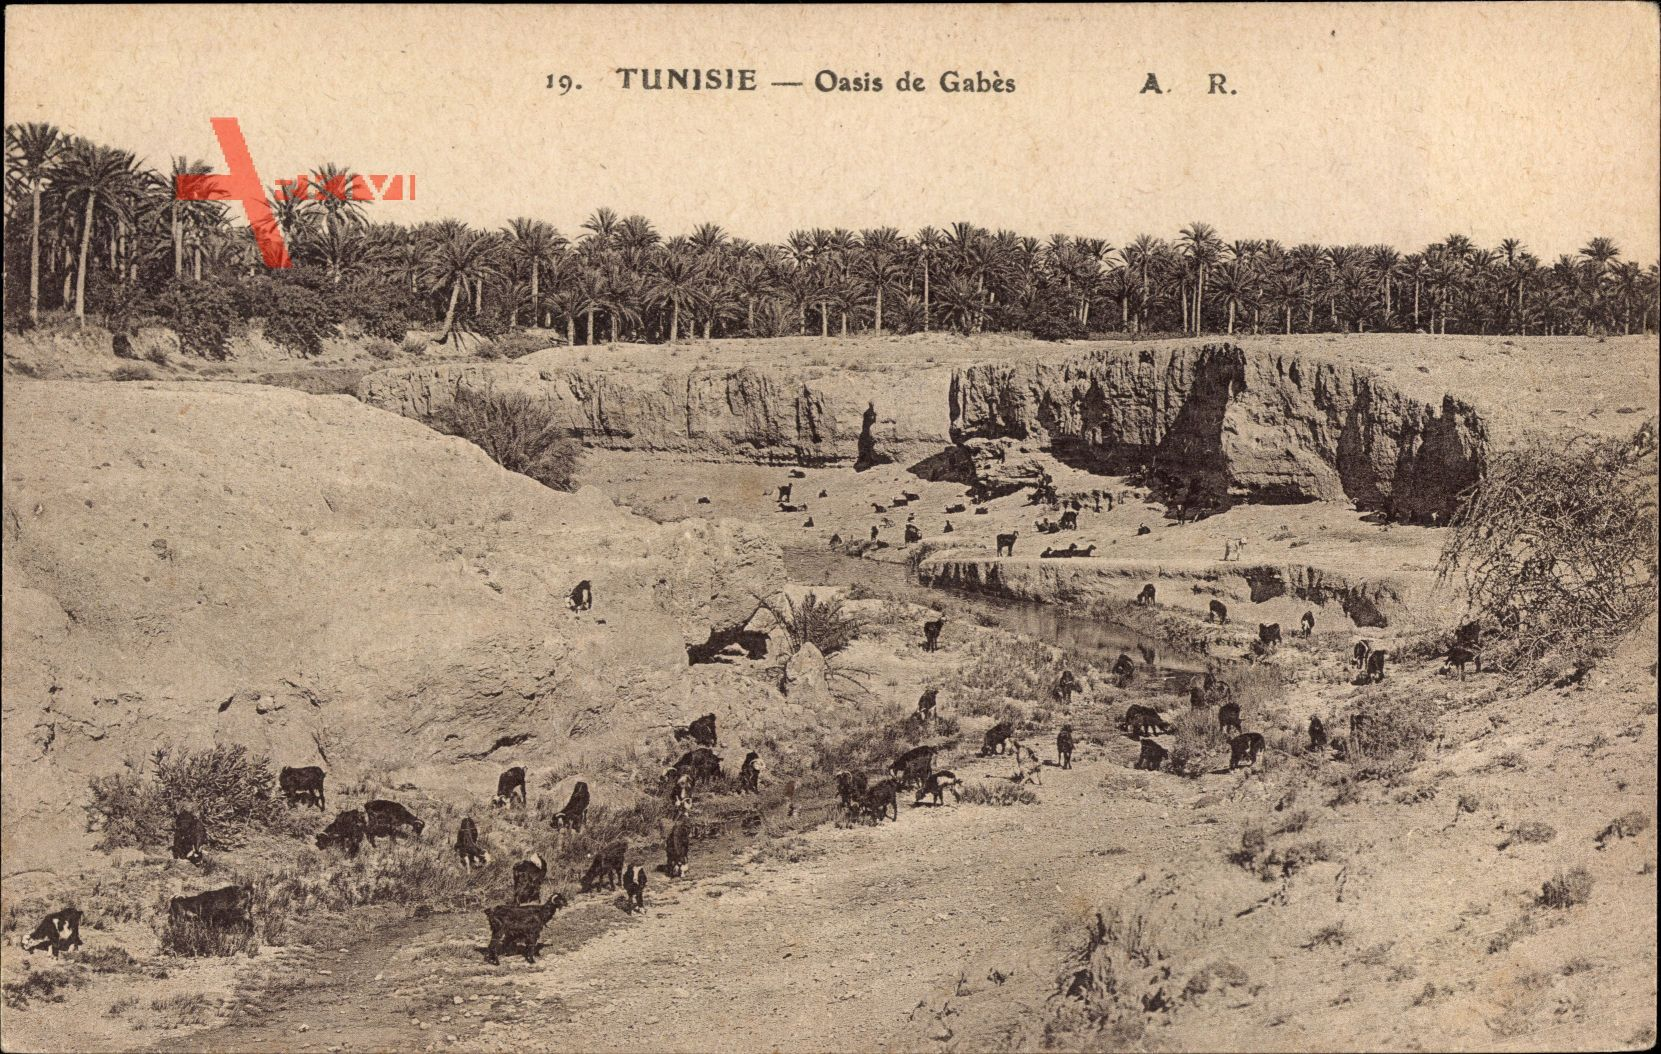 Gabès Tunesien, Oasis, Ziegen an einem Flussbett